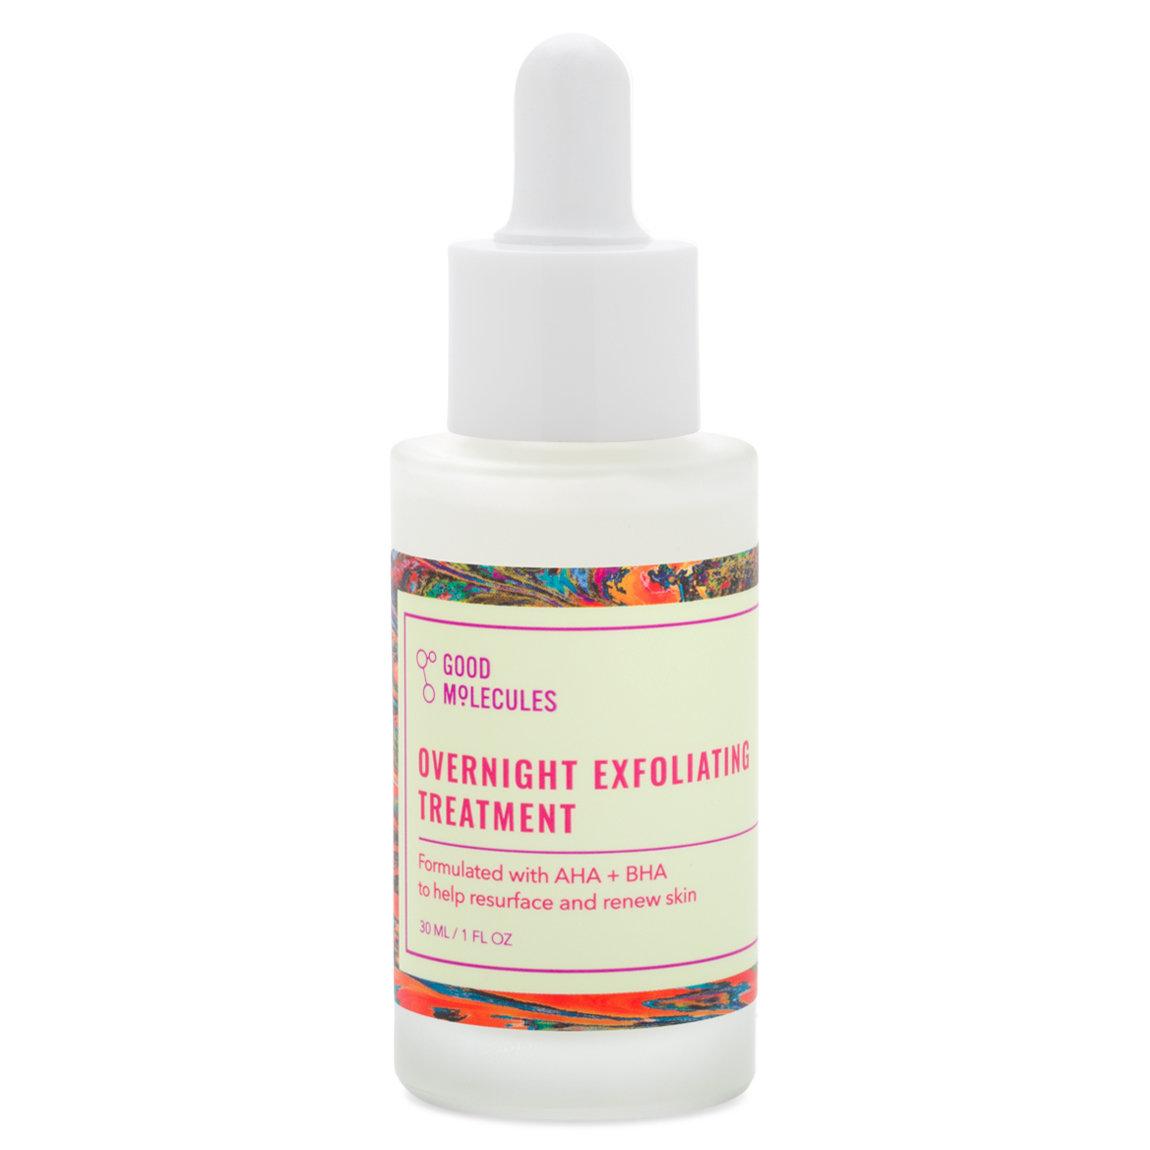 Good Molecules - Overnight Exfoliating Treatment